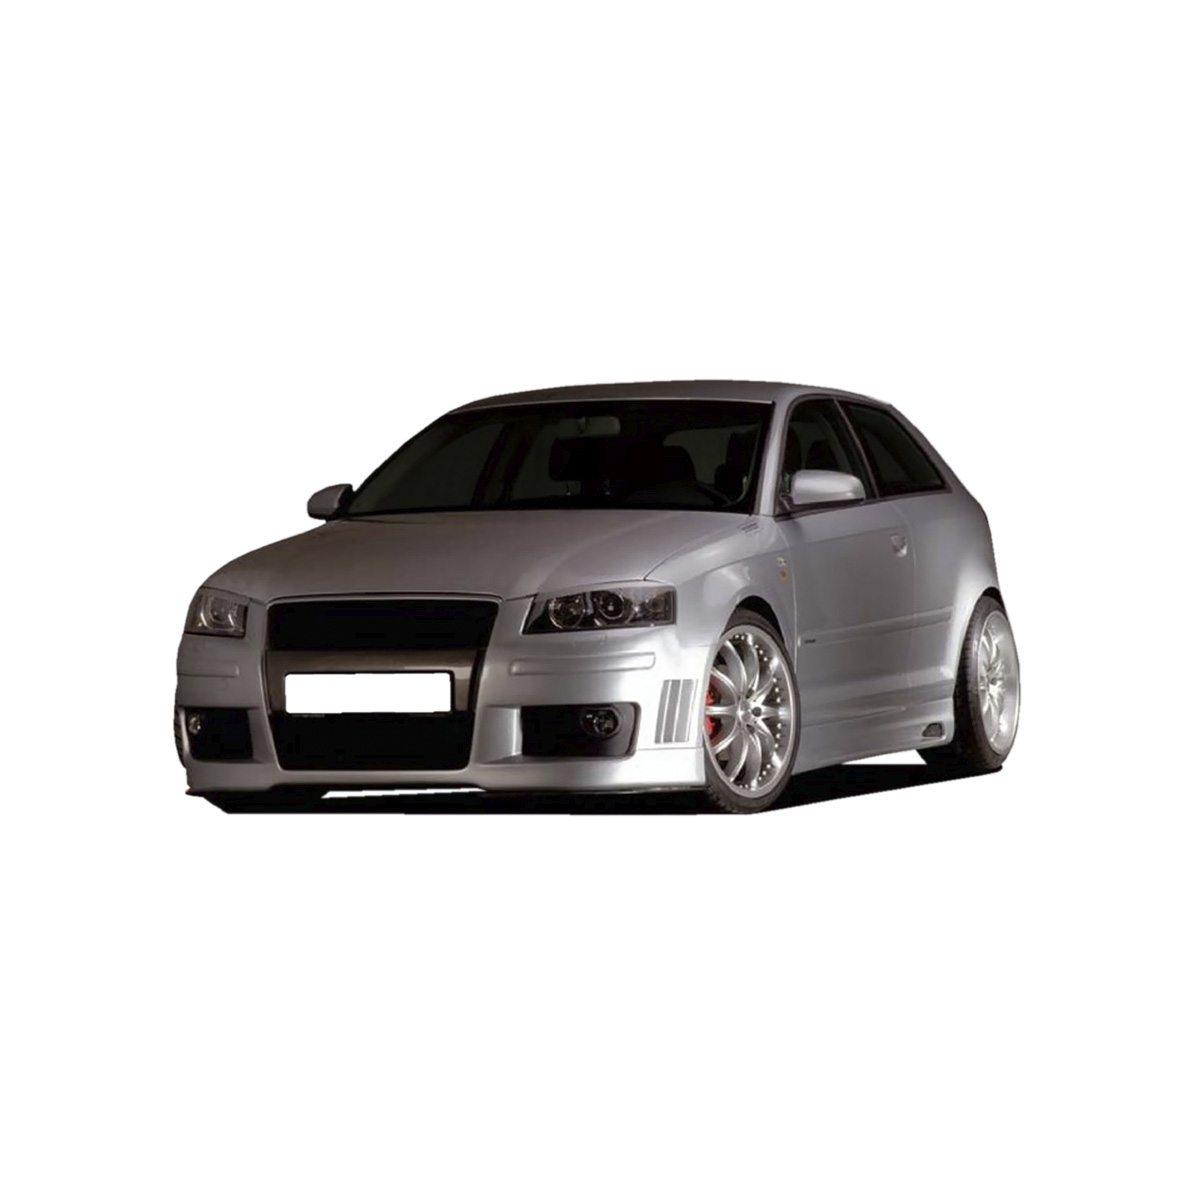 Audi-A3-2003-Race-Frt-PCU1182